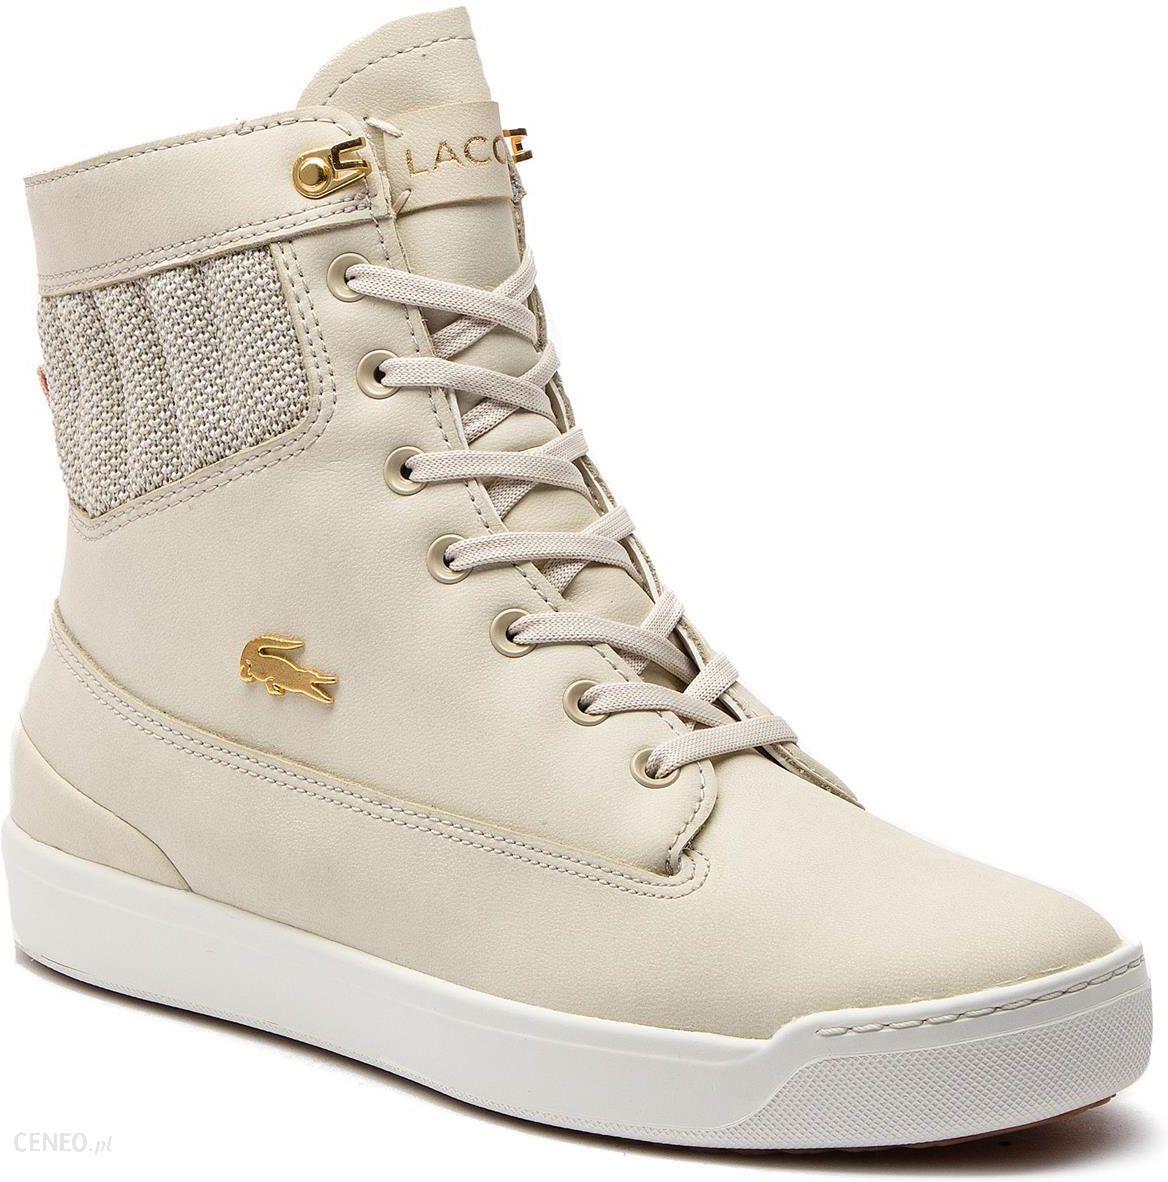 Sneakersy LACOSTE Explorateur Hi 318 1 Caw 7 36CAW0007TS2 NatOff Wht Ceny i opinie Ceneo.pl